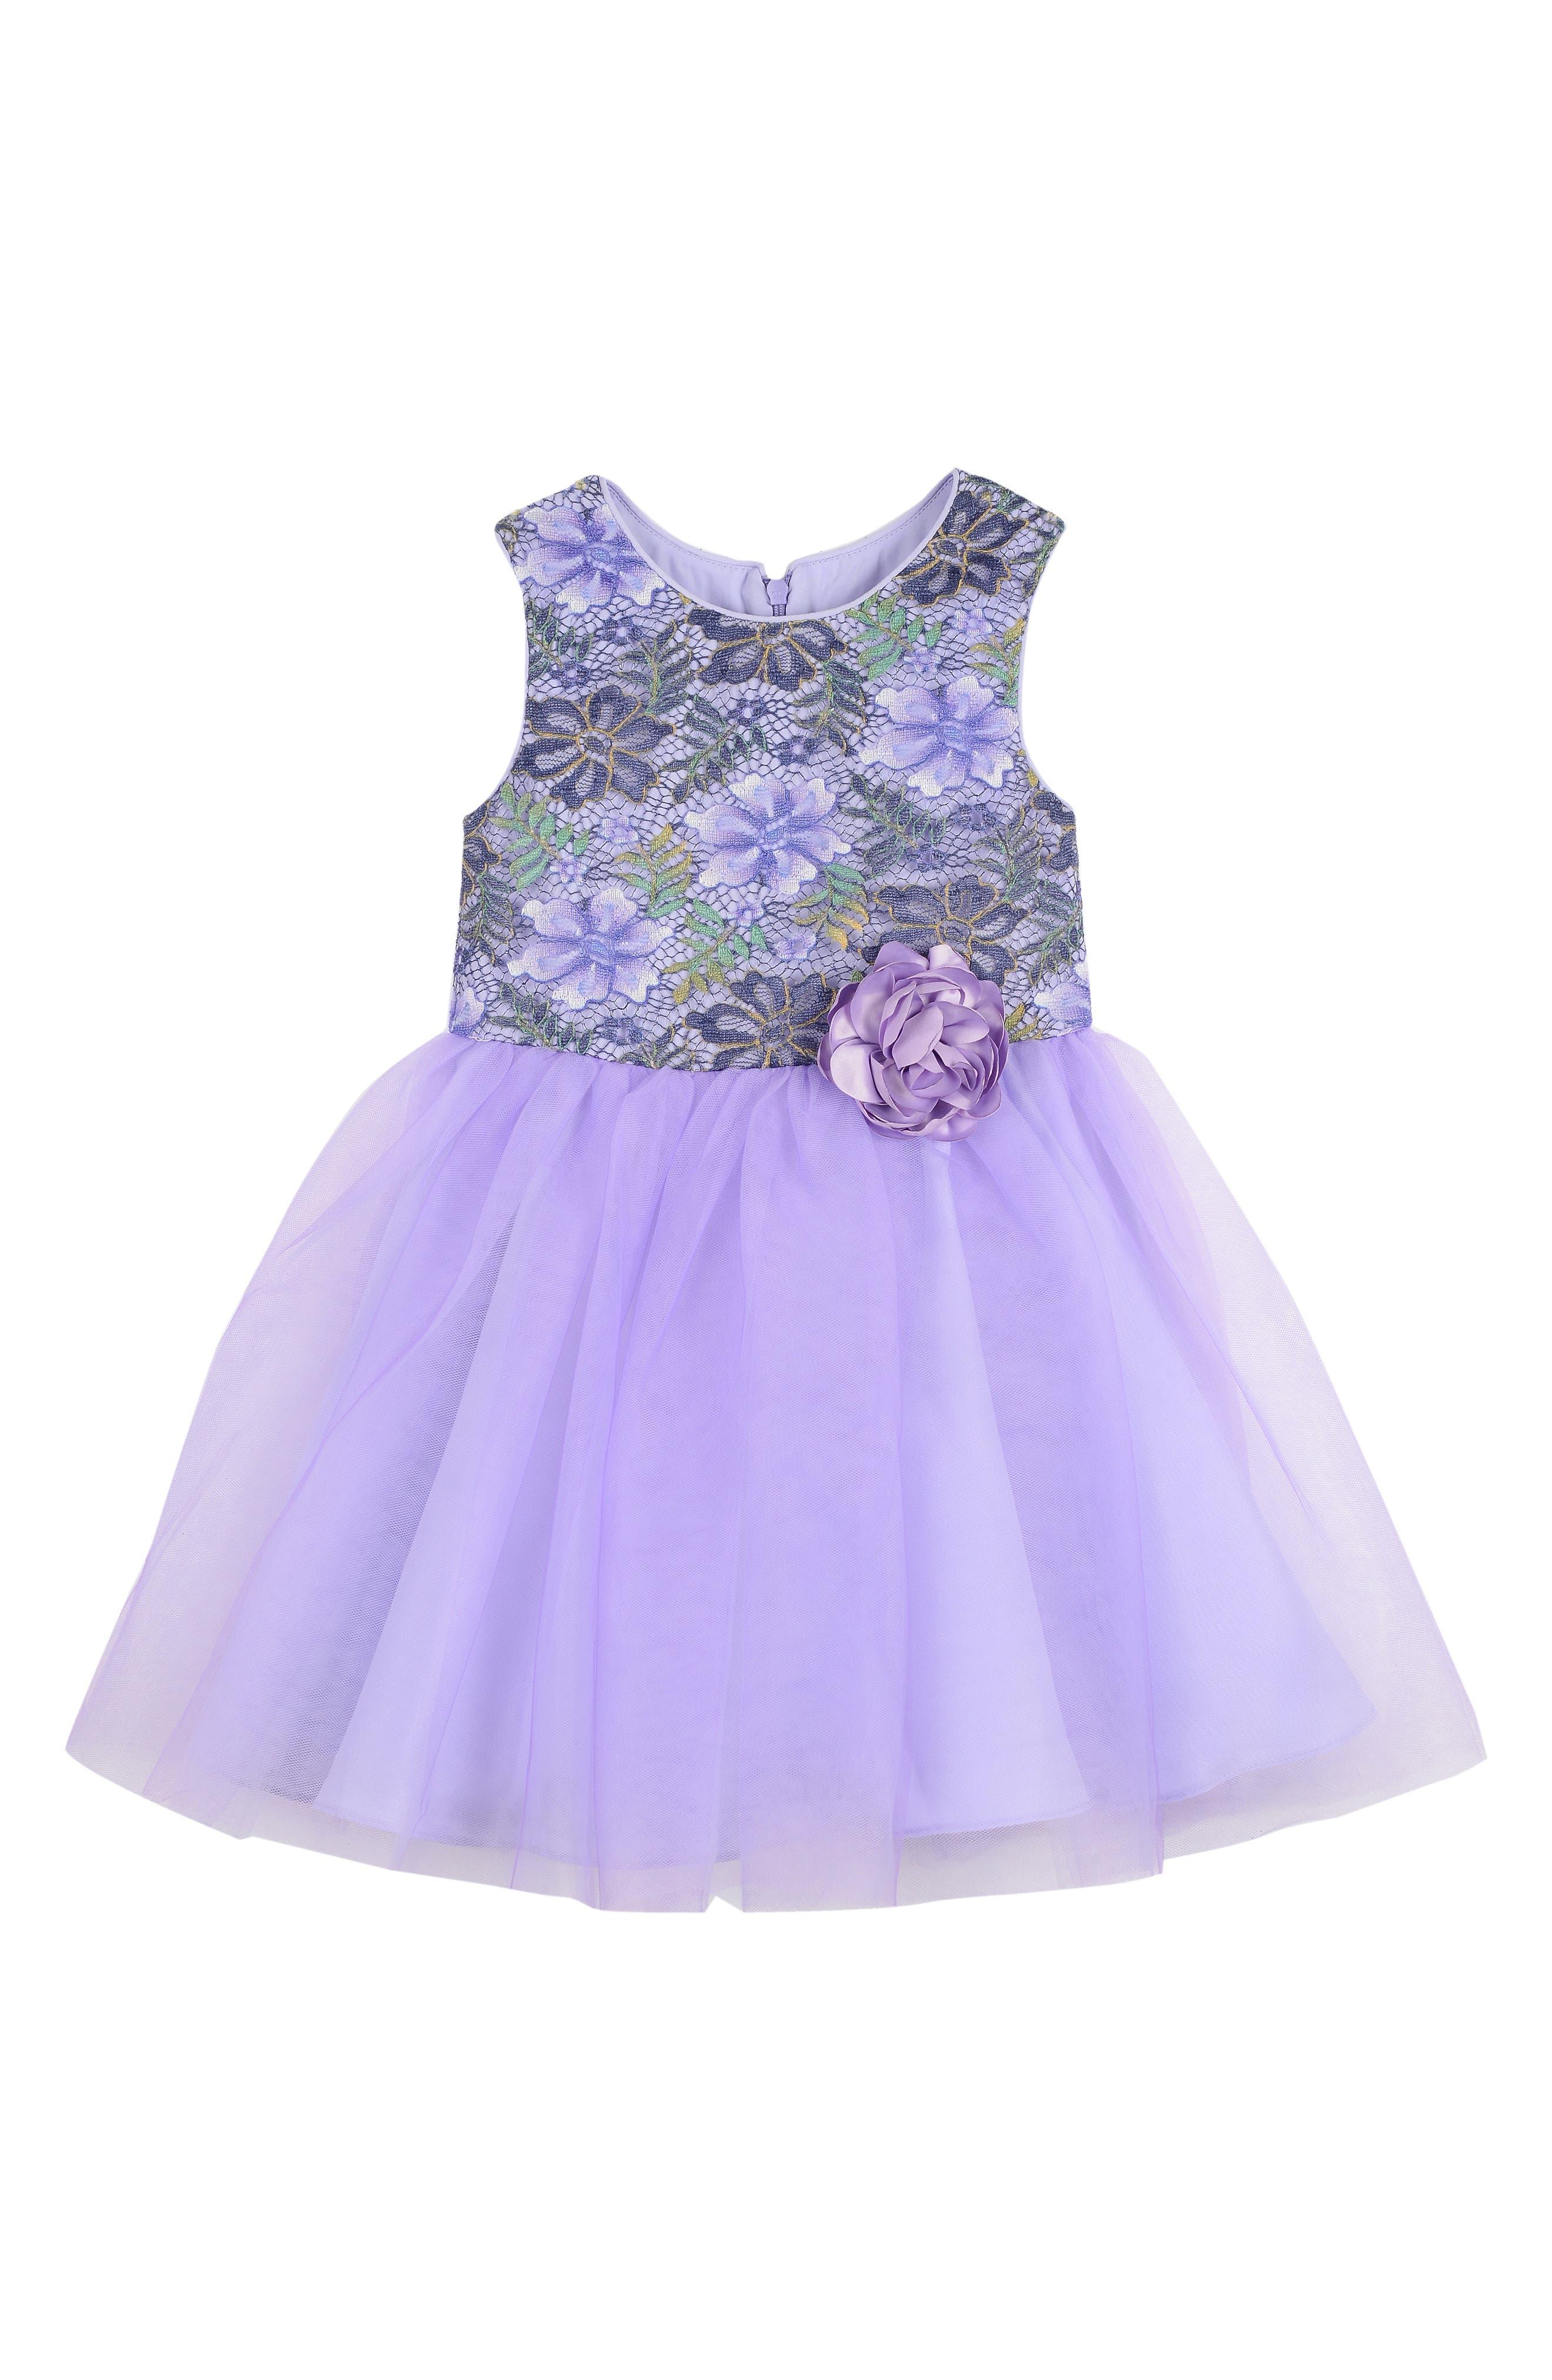 Girls Pippa  Julie Enchanted Forest Lace Ballerina Dress Size 5  Purple